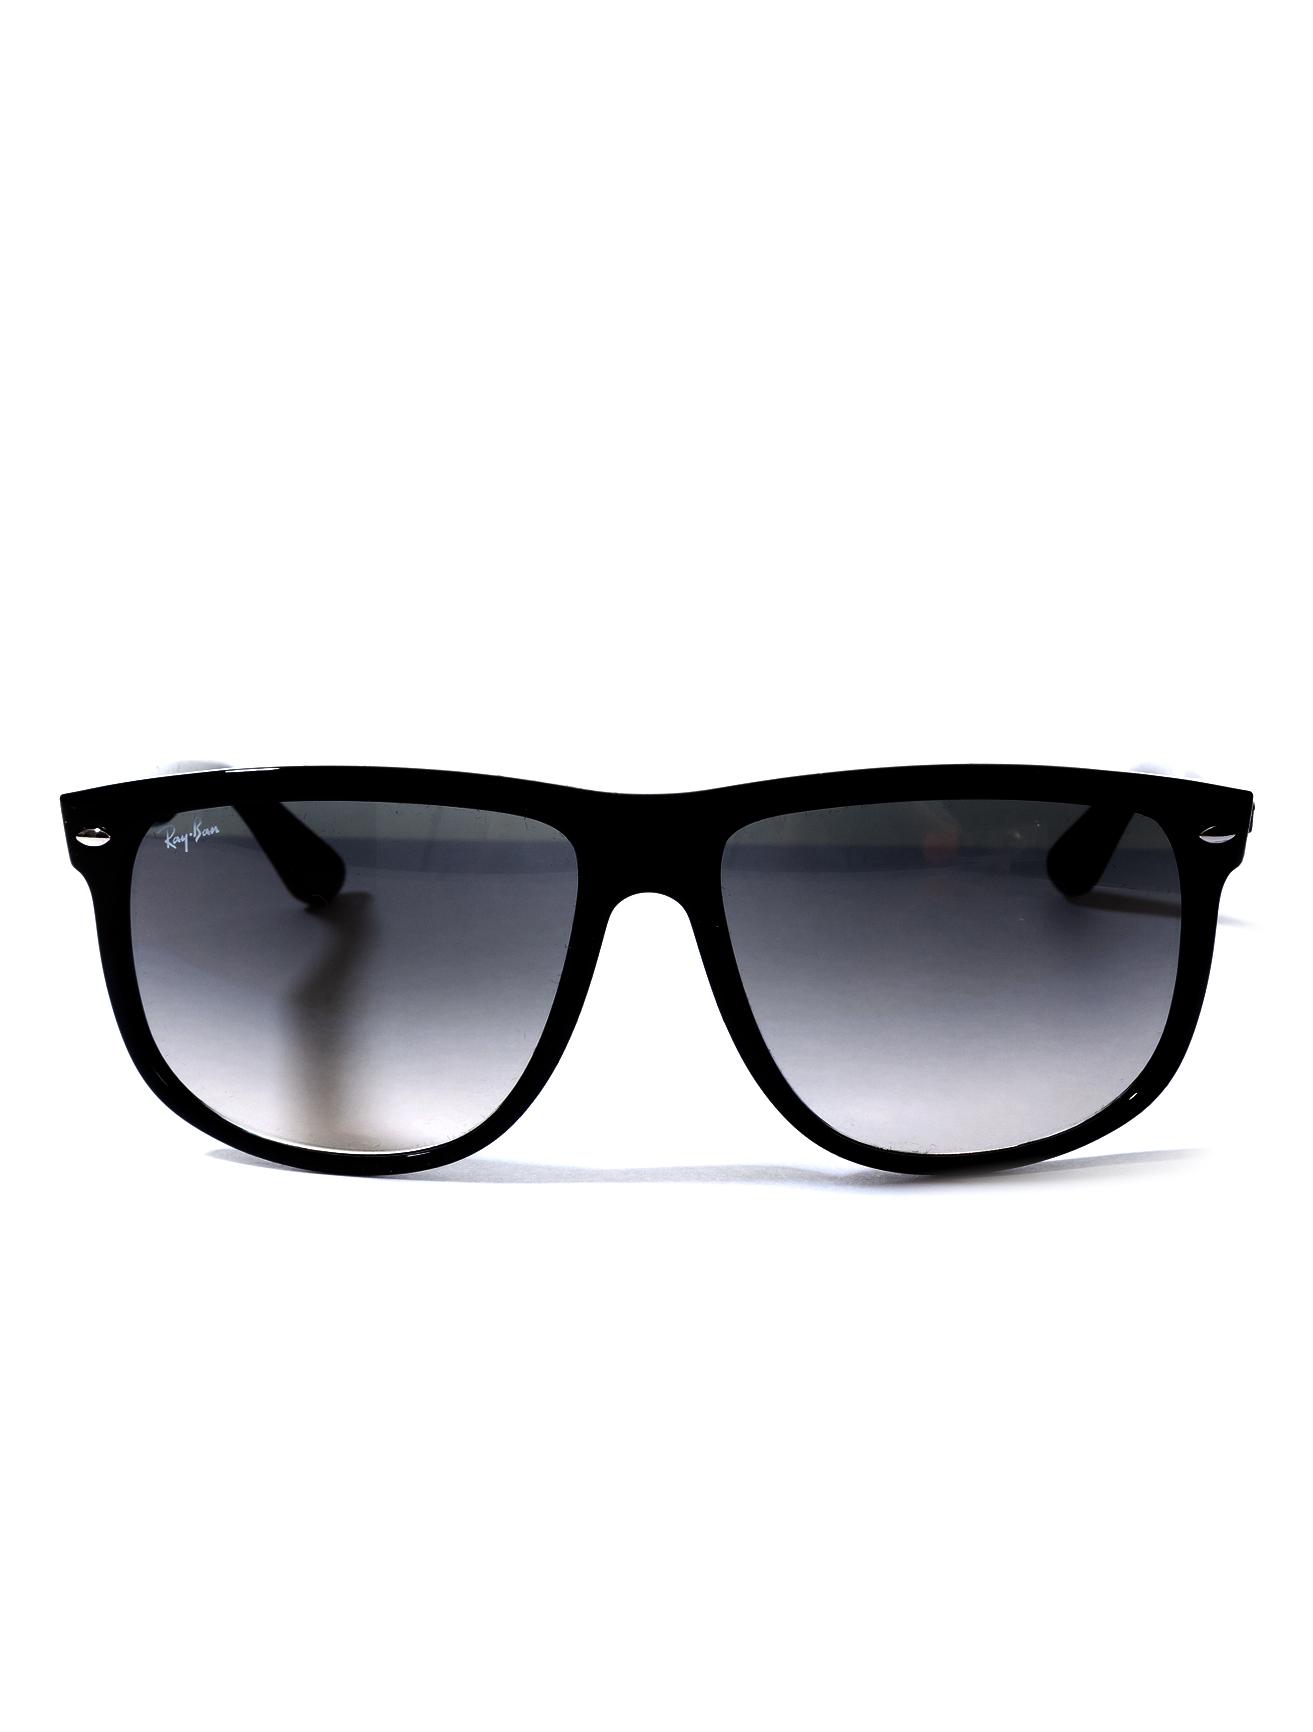 oakley prescription sunglasses warranty